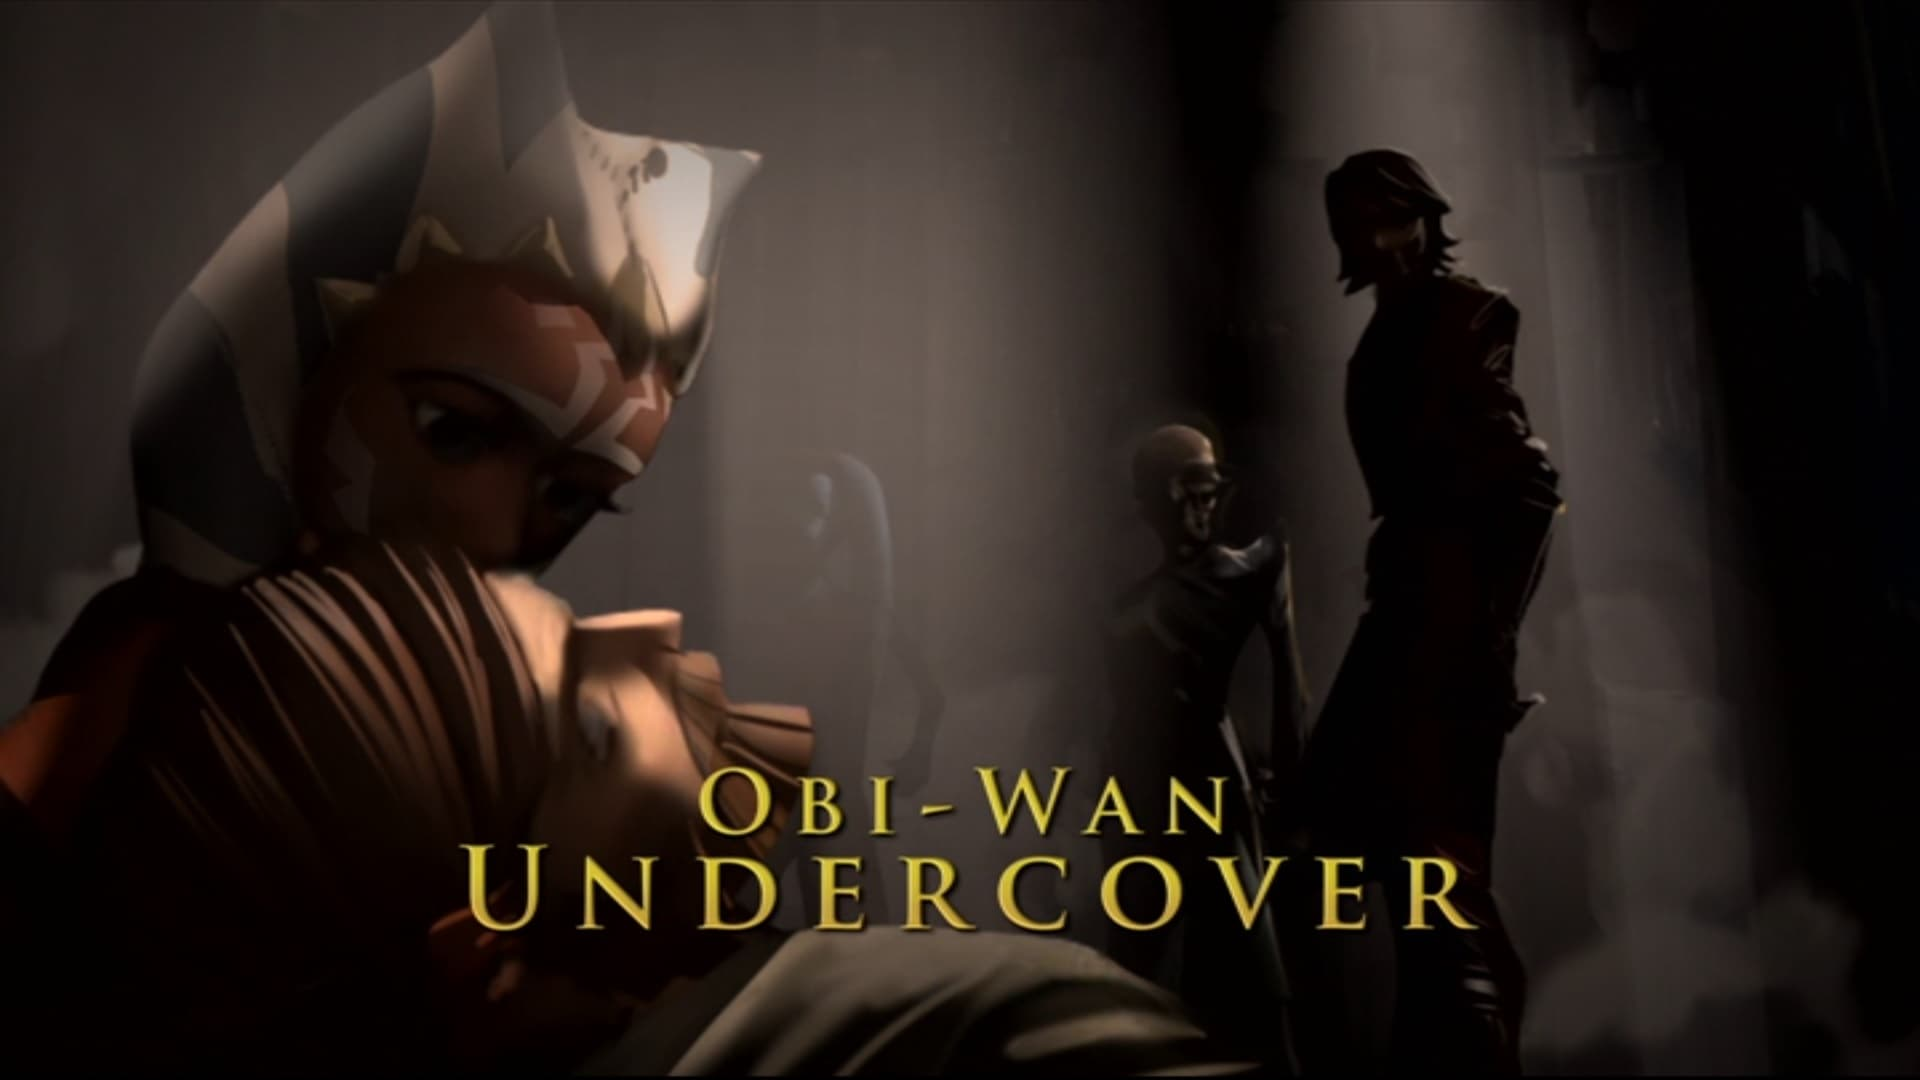 Star Wars: The Clone Wars - Season 0 Episode 116 : Obi-Wan Undercover Video Comentary